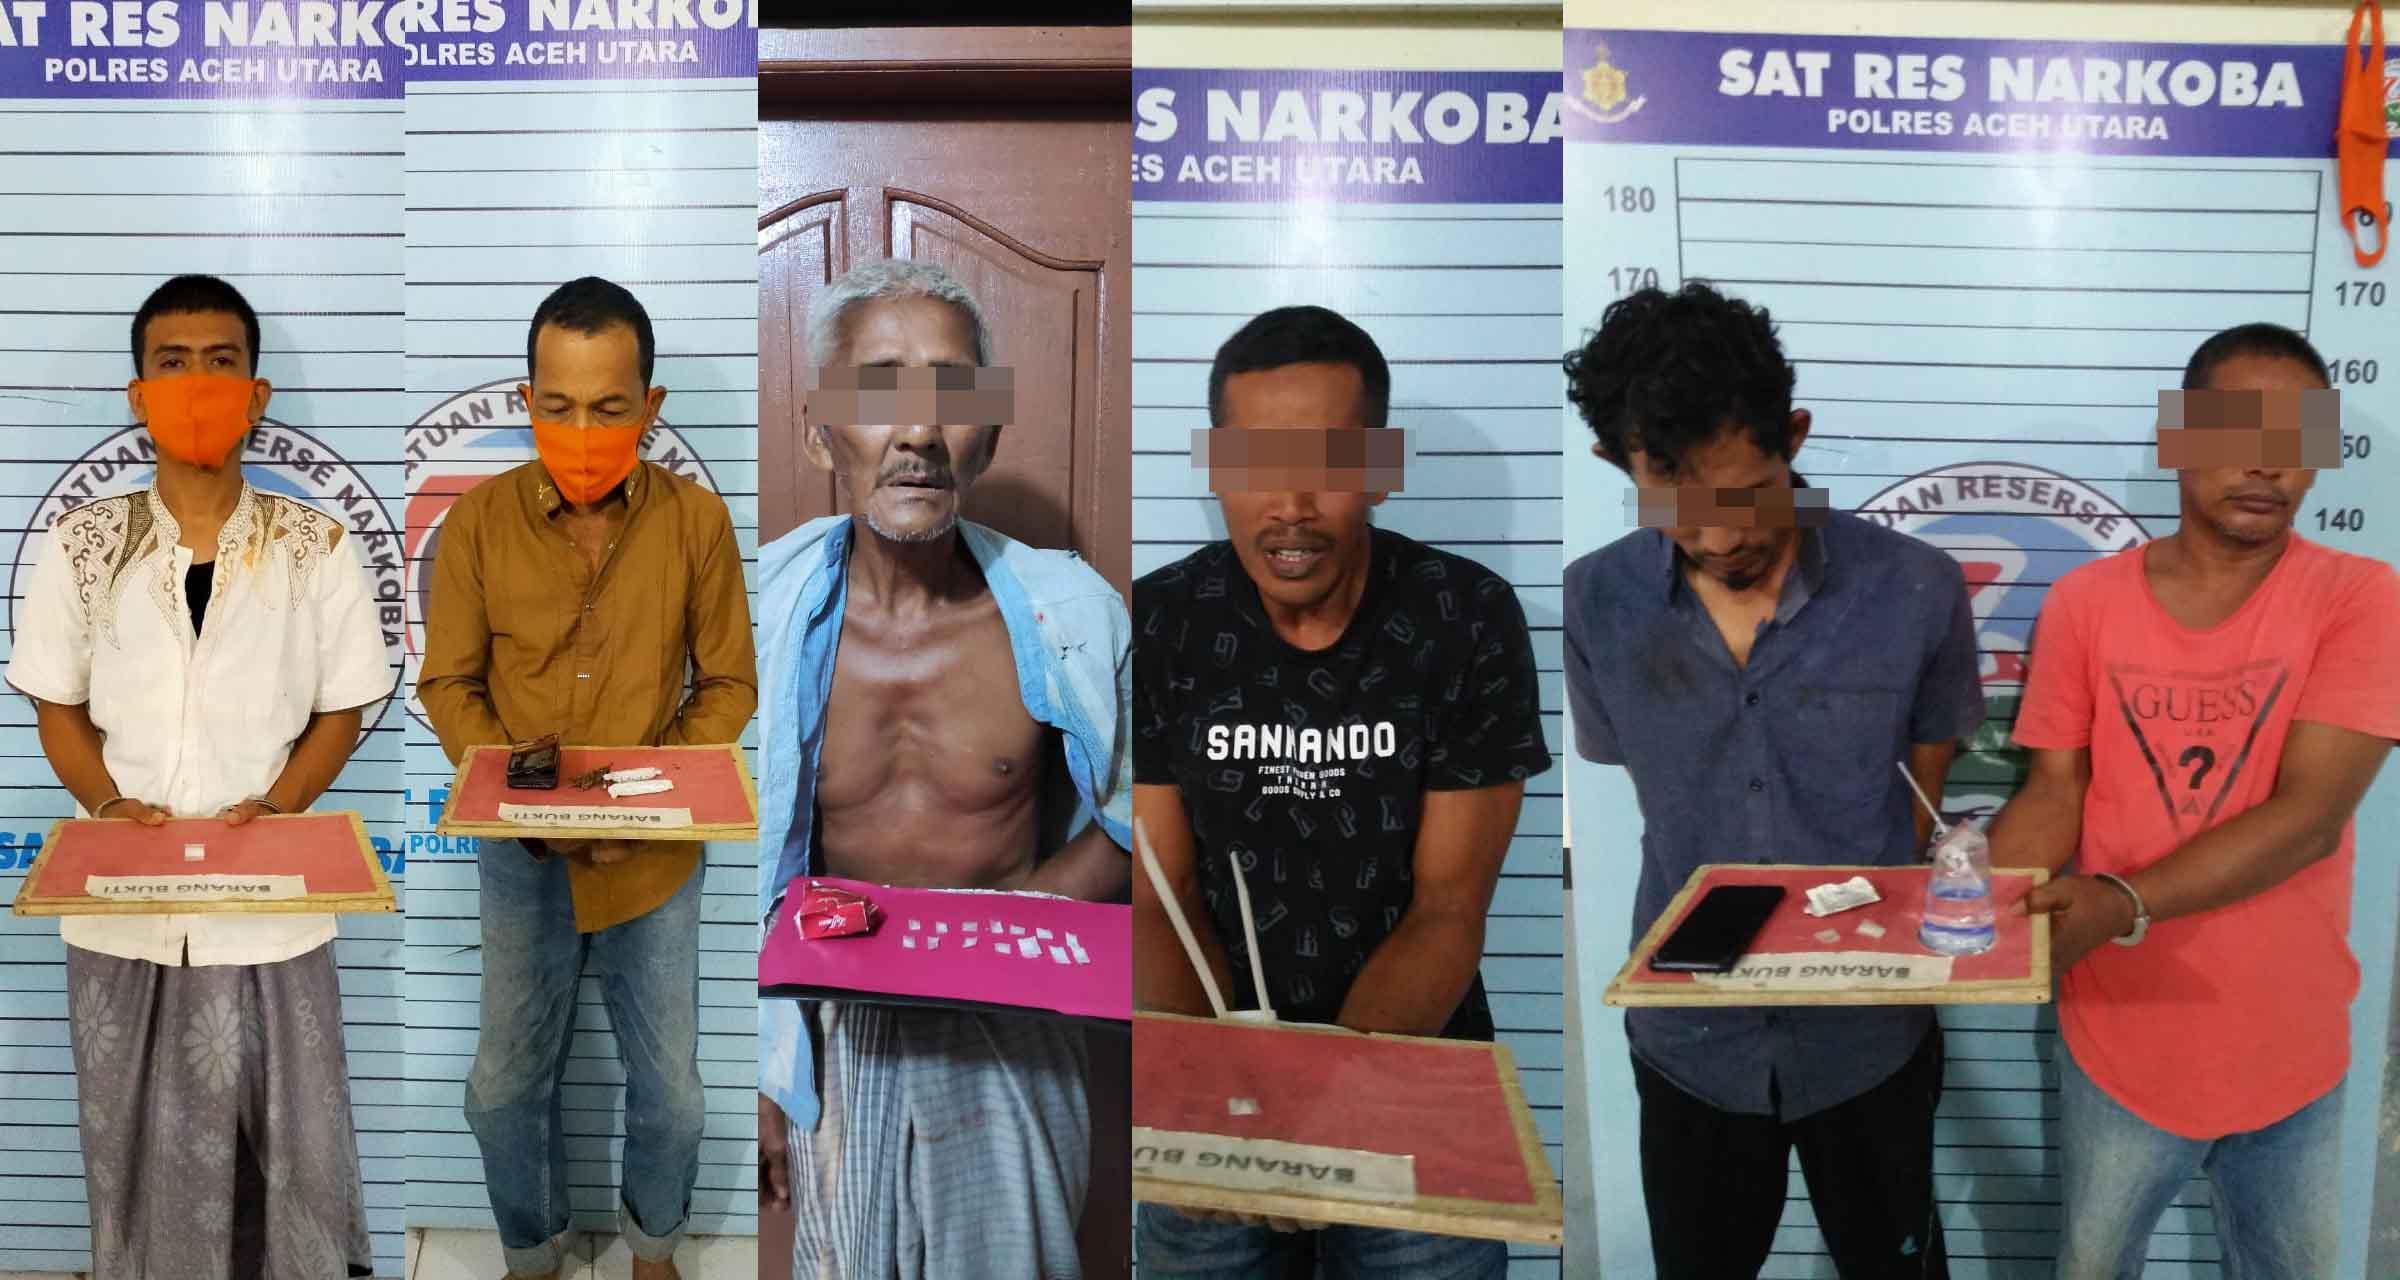 Dua Pekan Ramadhan, Polres Aceh Utara Ungkap 6 Kasus Narkoba